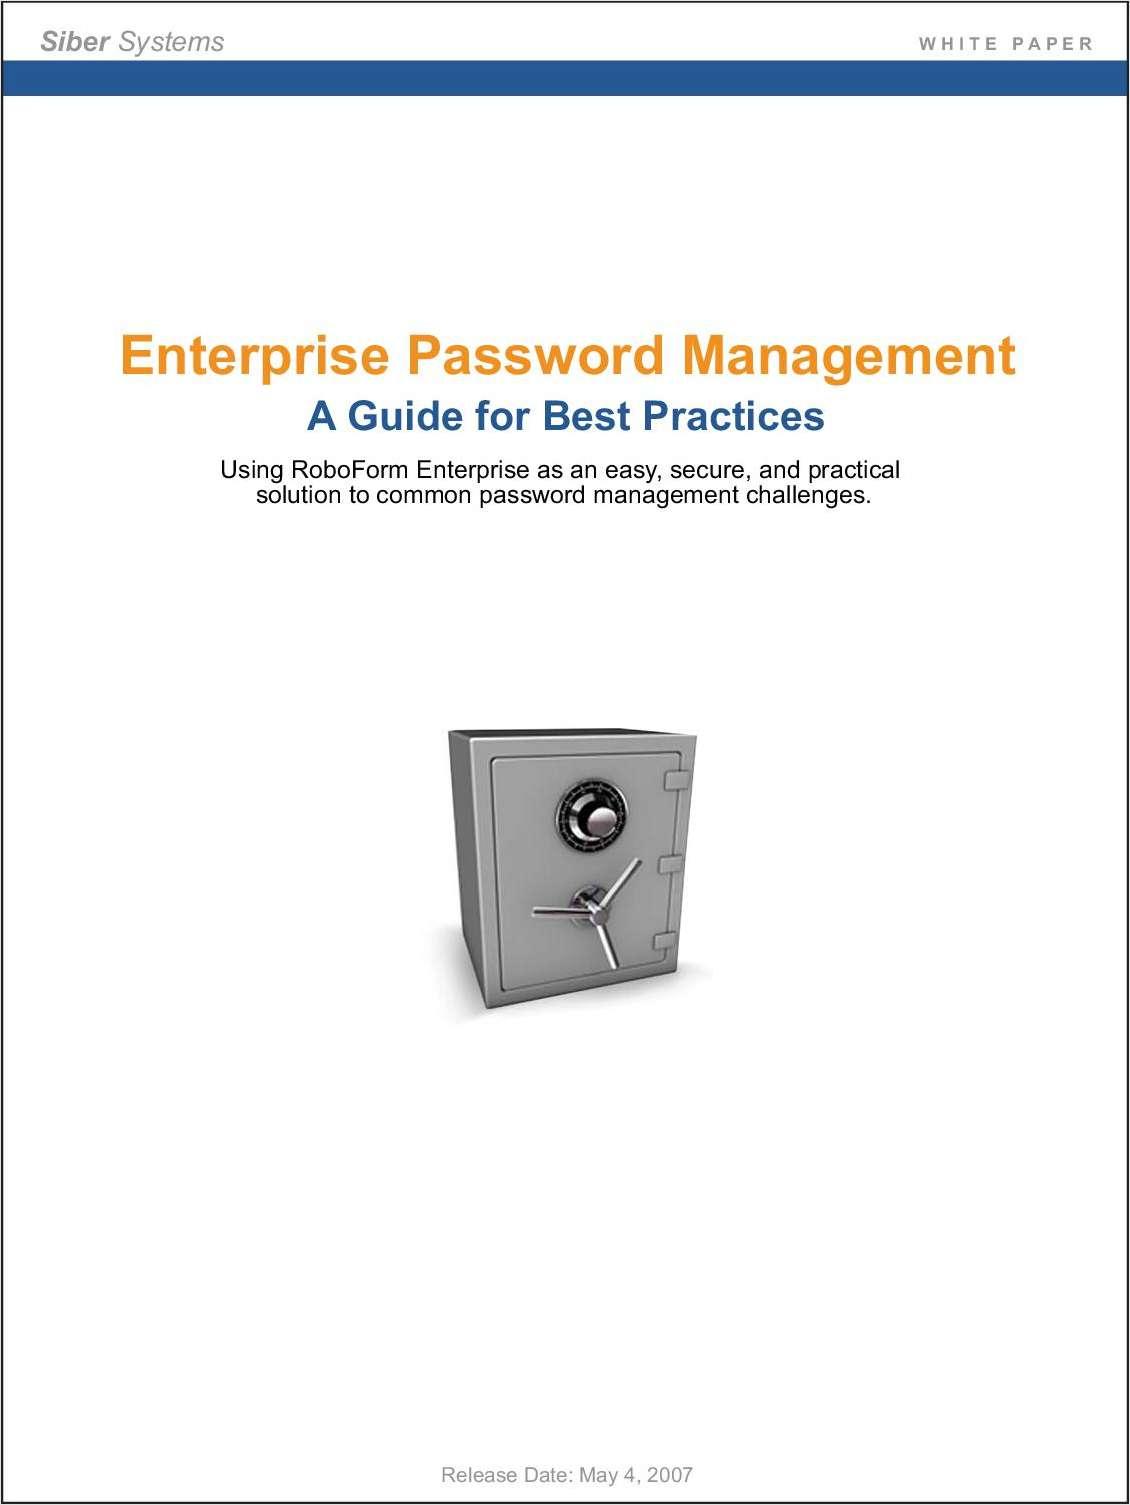 Enterprise Password Management - A Guide for Best Practices